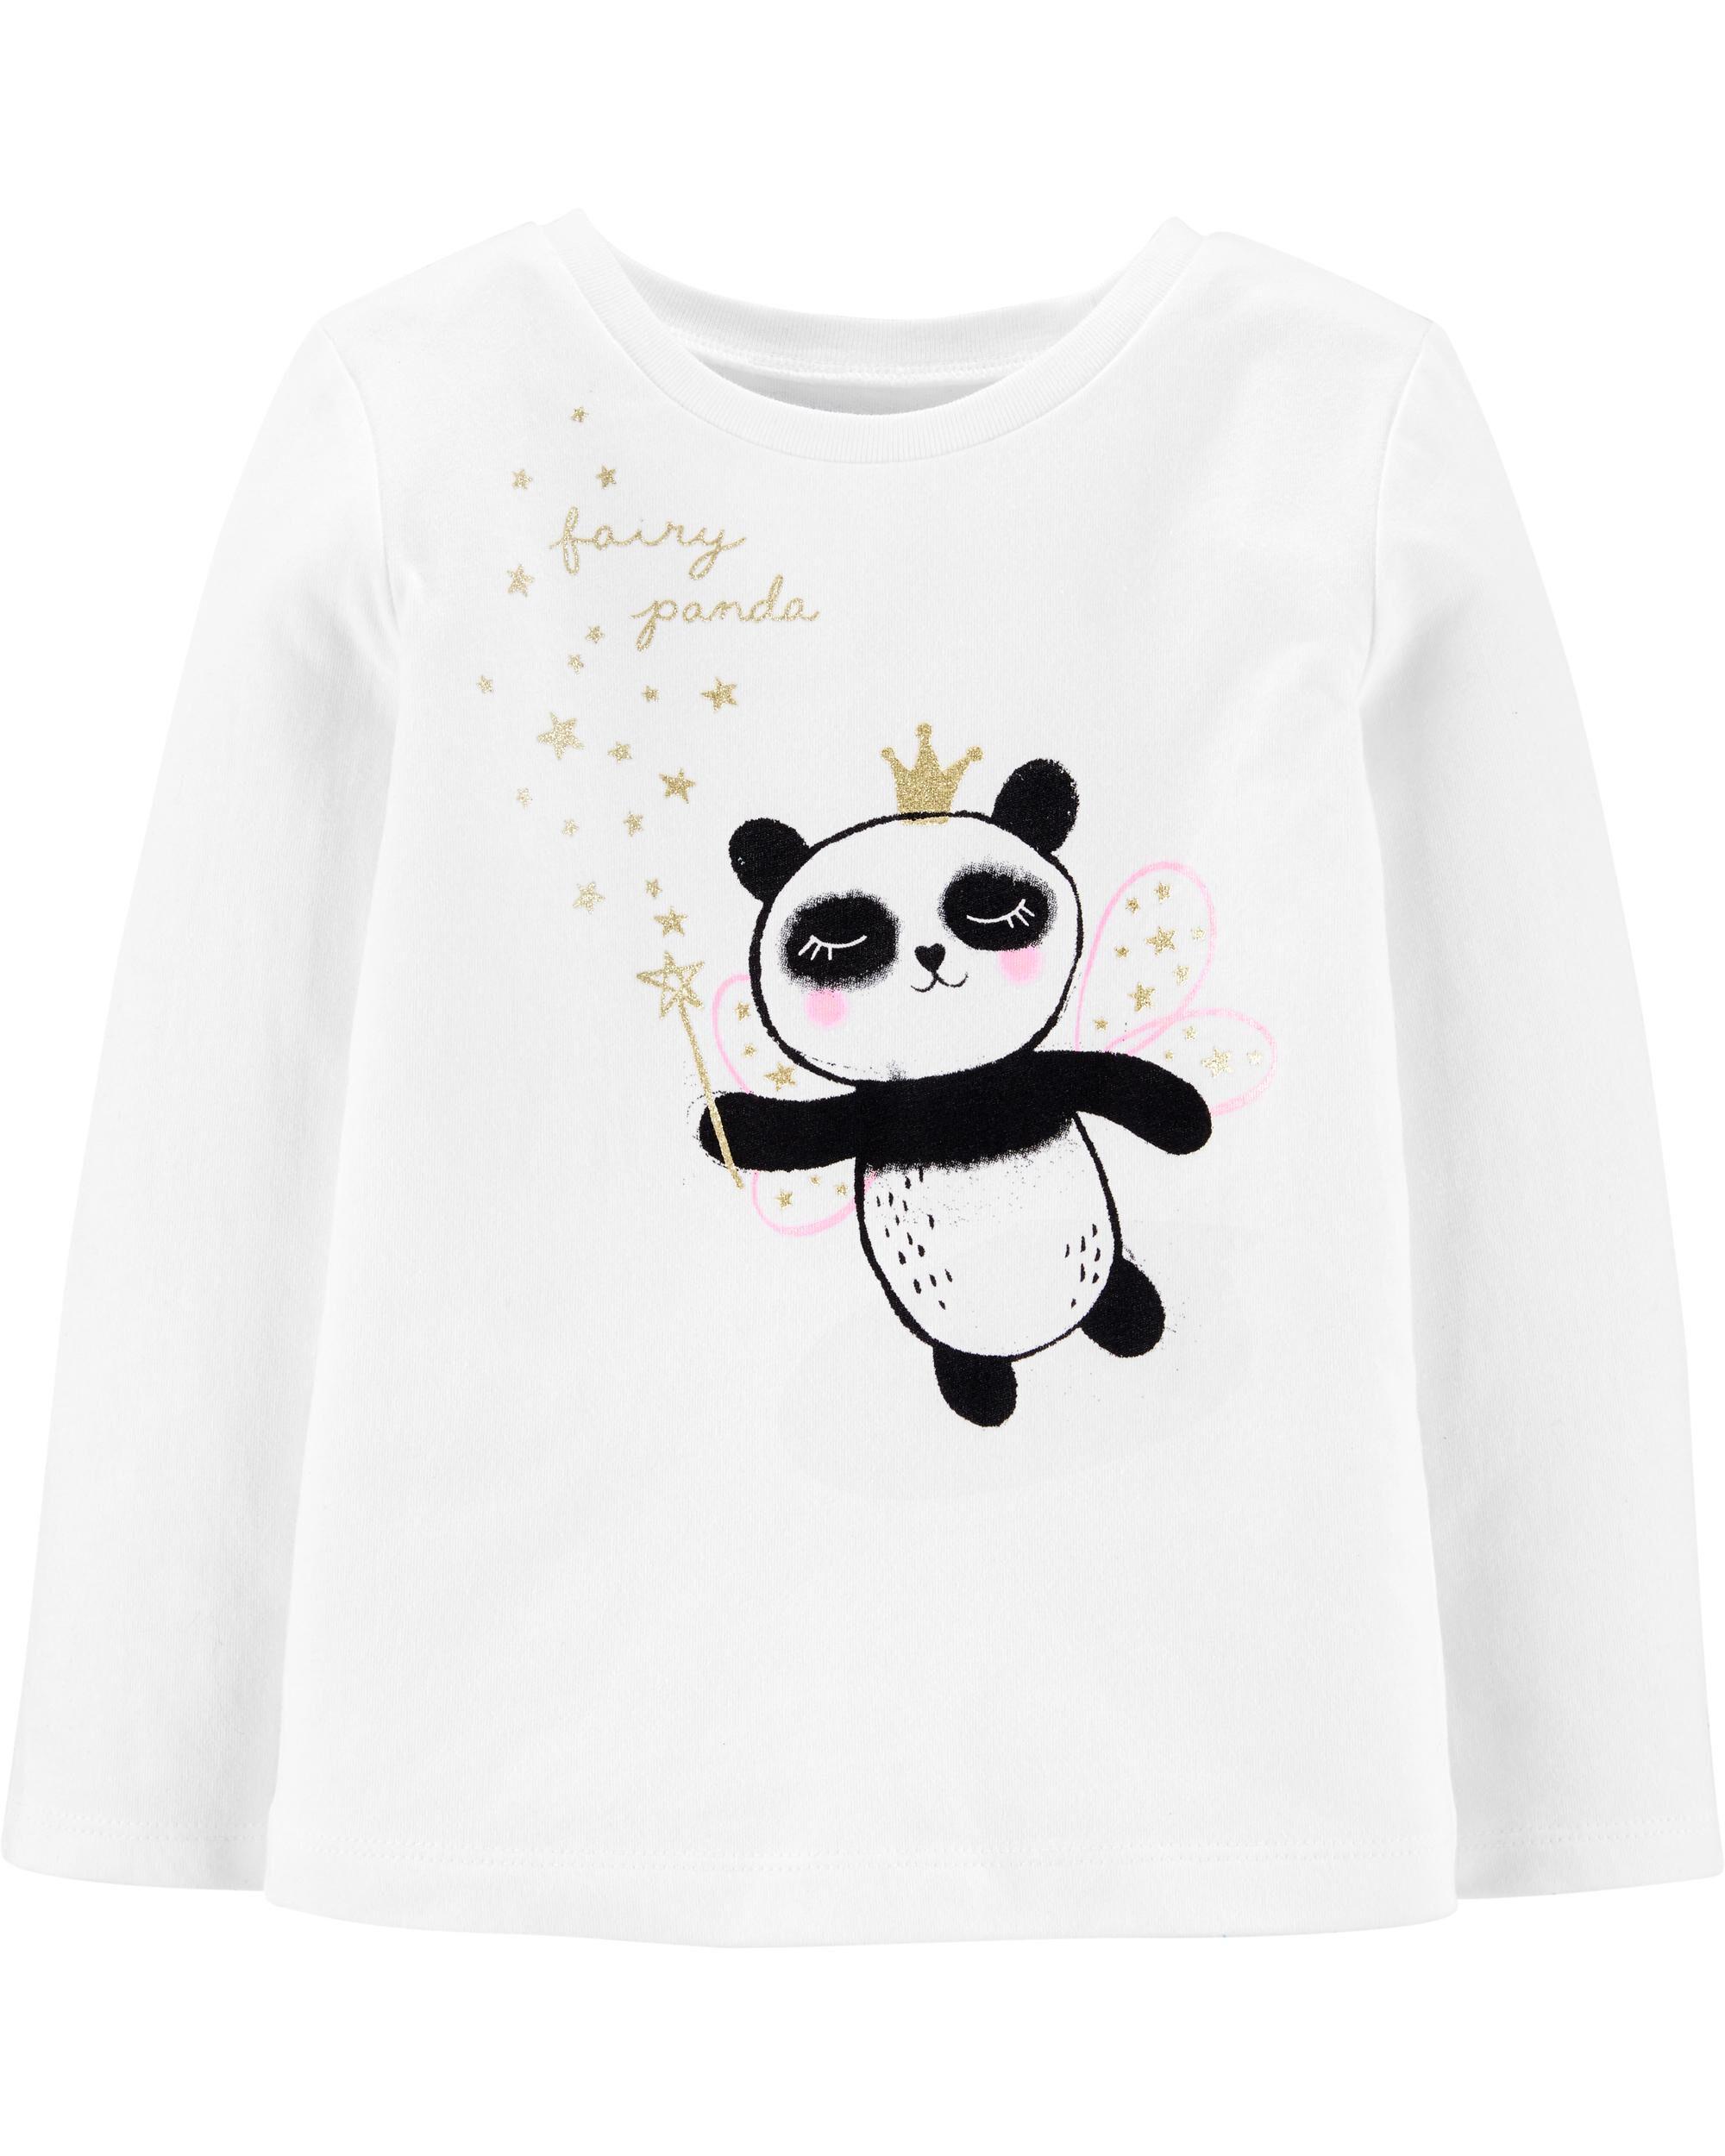 *DOORBUSTER* Glitter Fairy Panda Jersey Tee